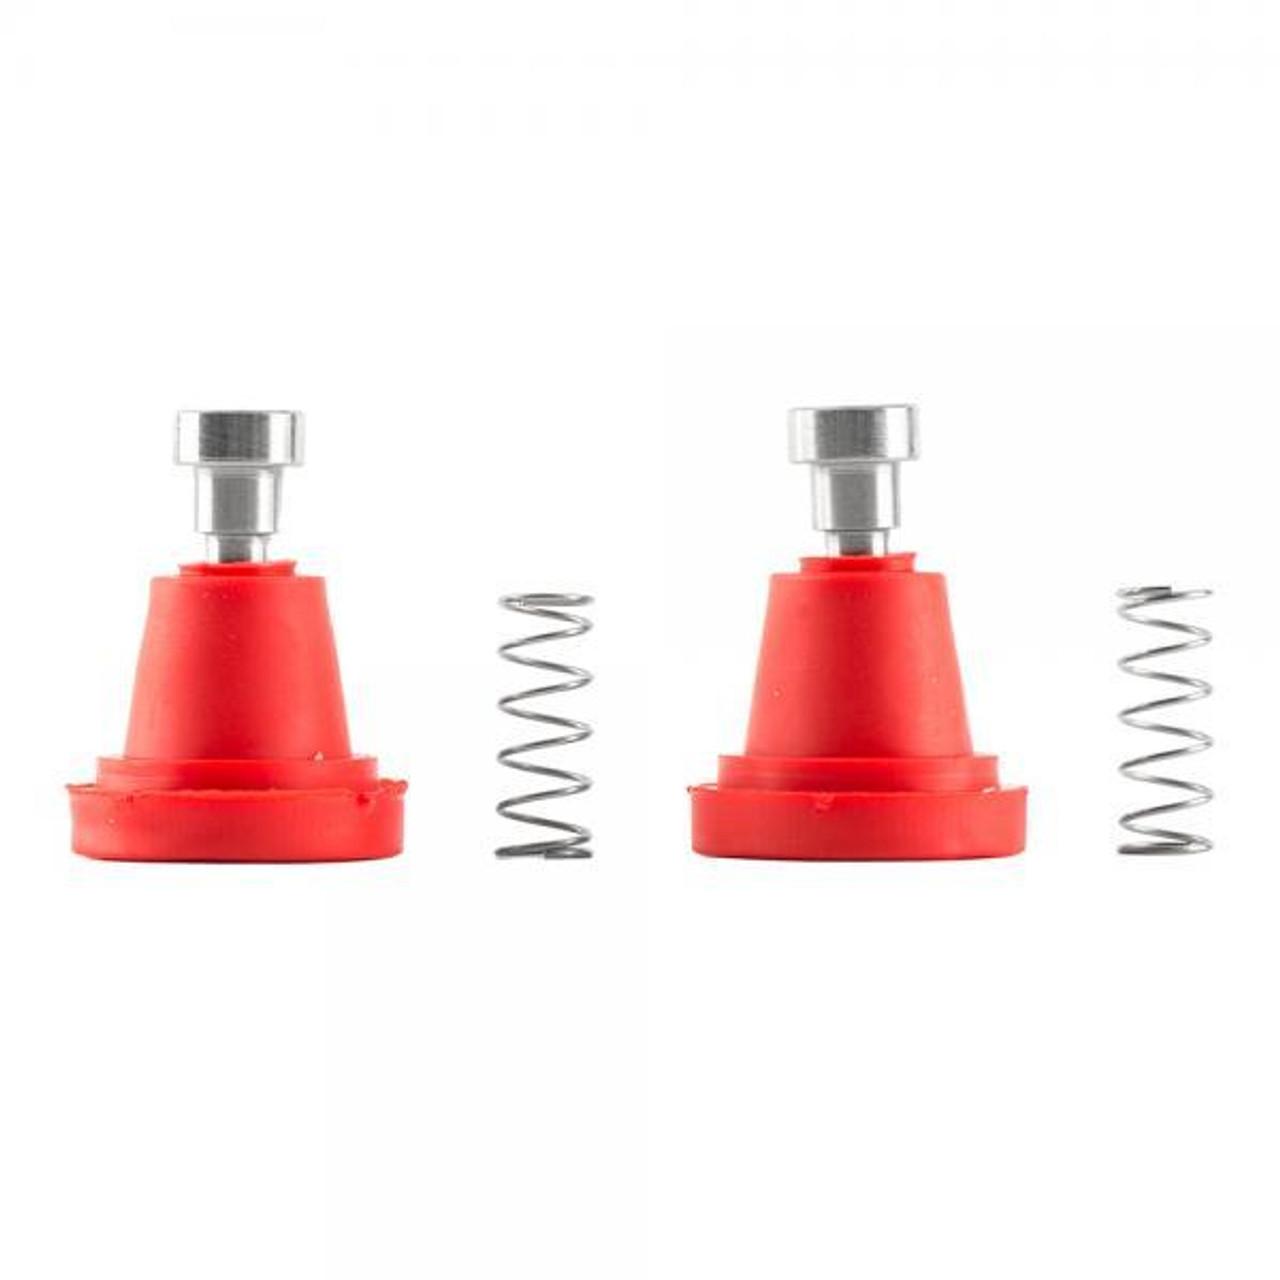 Kit rubber boot for master cylinder (Braktec) (JI614-9240 2P)